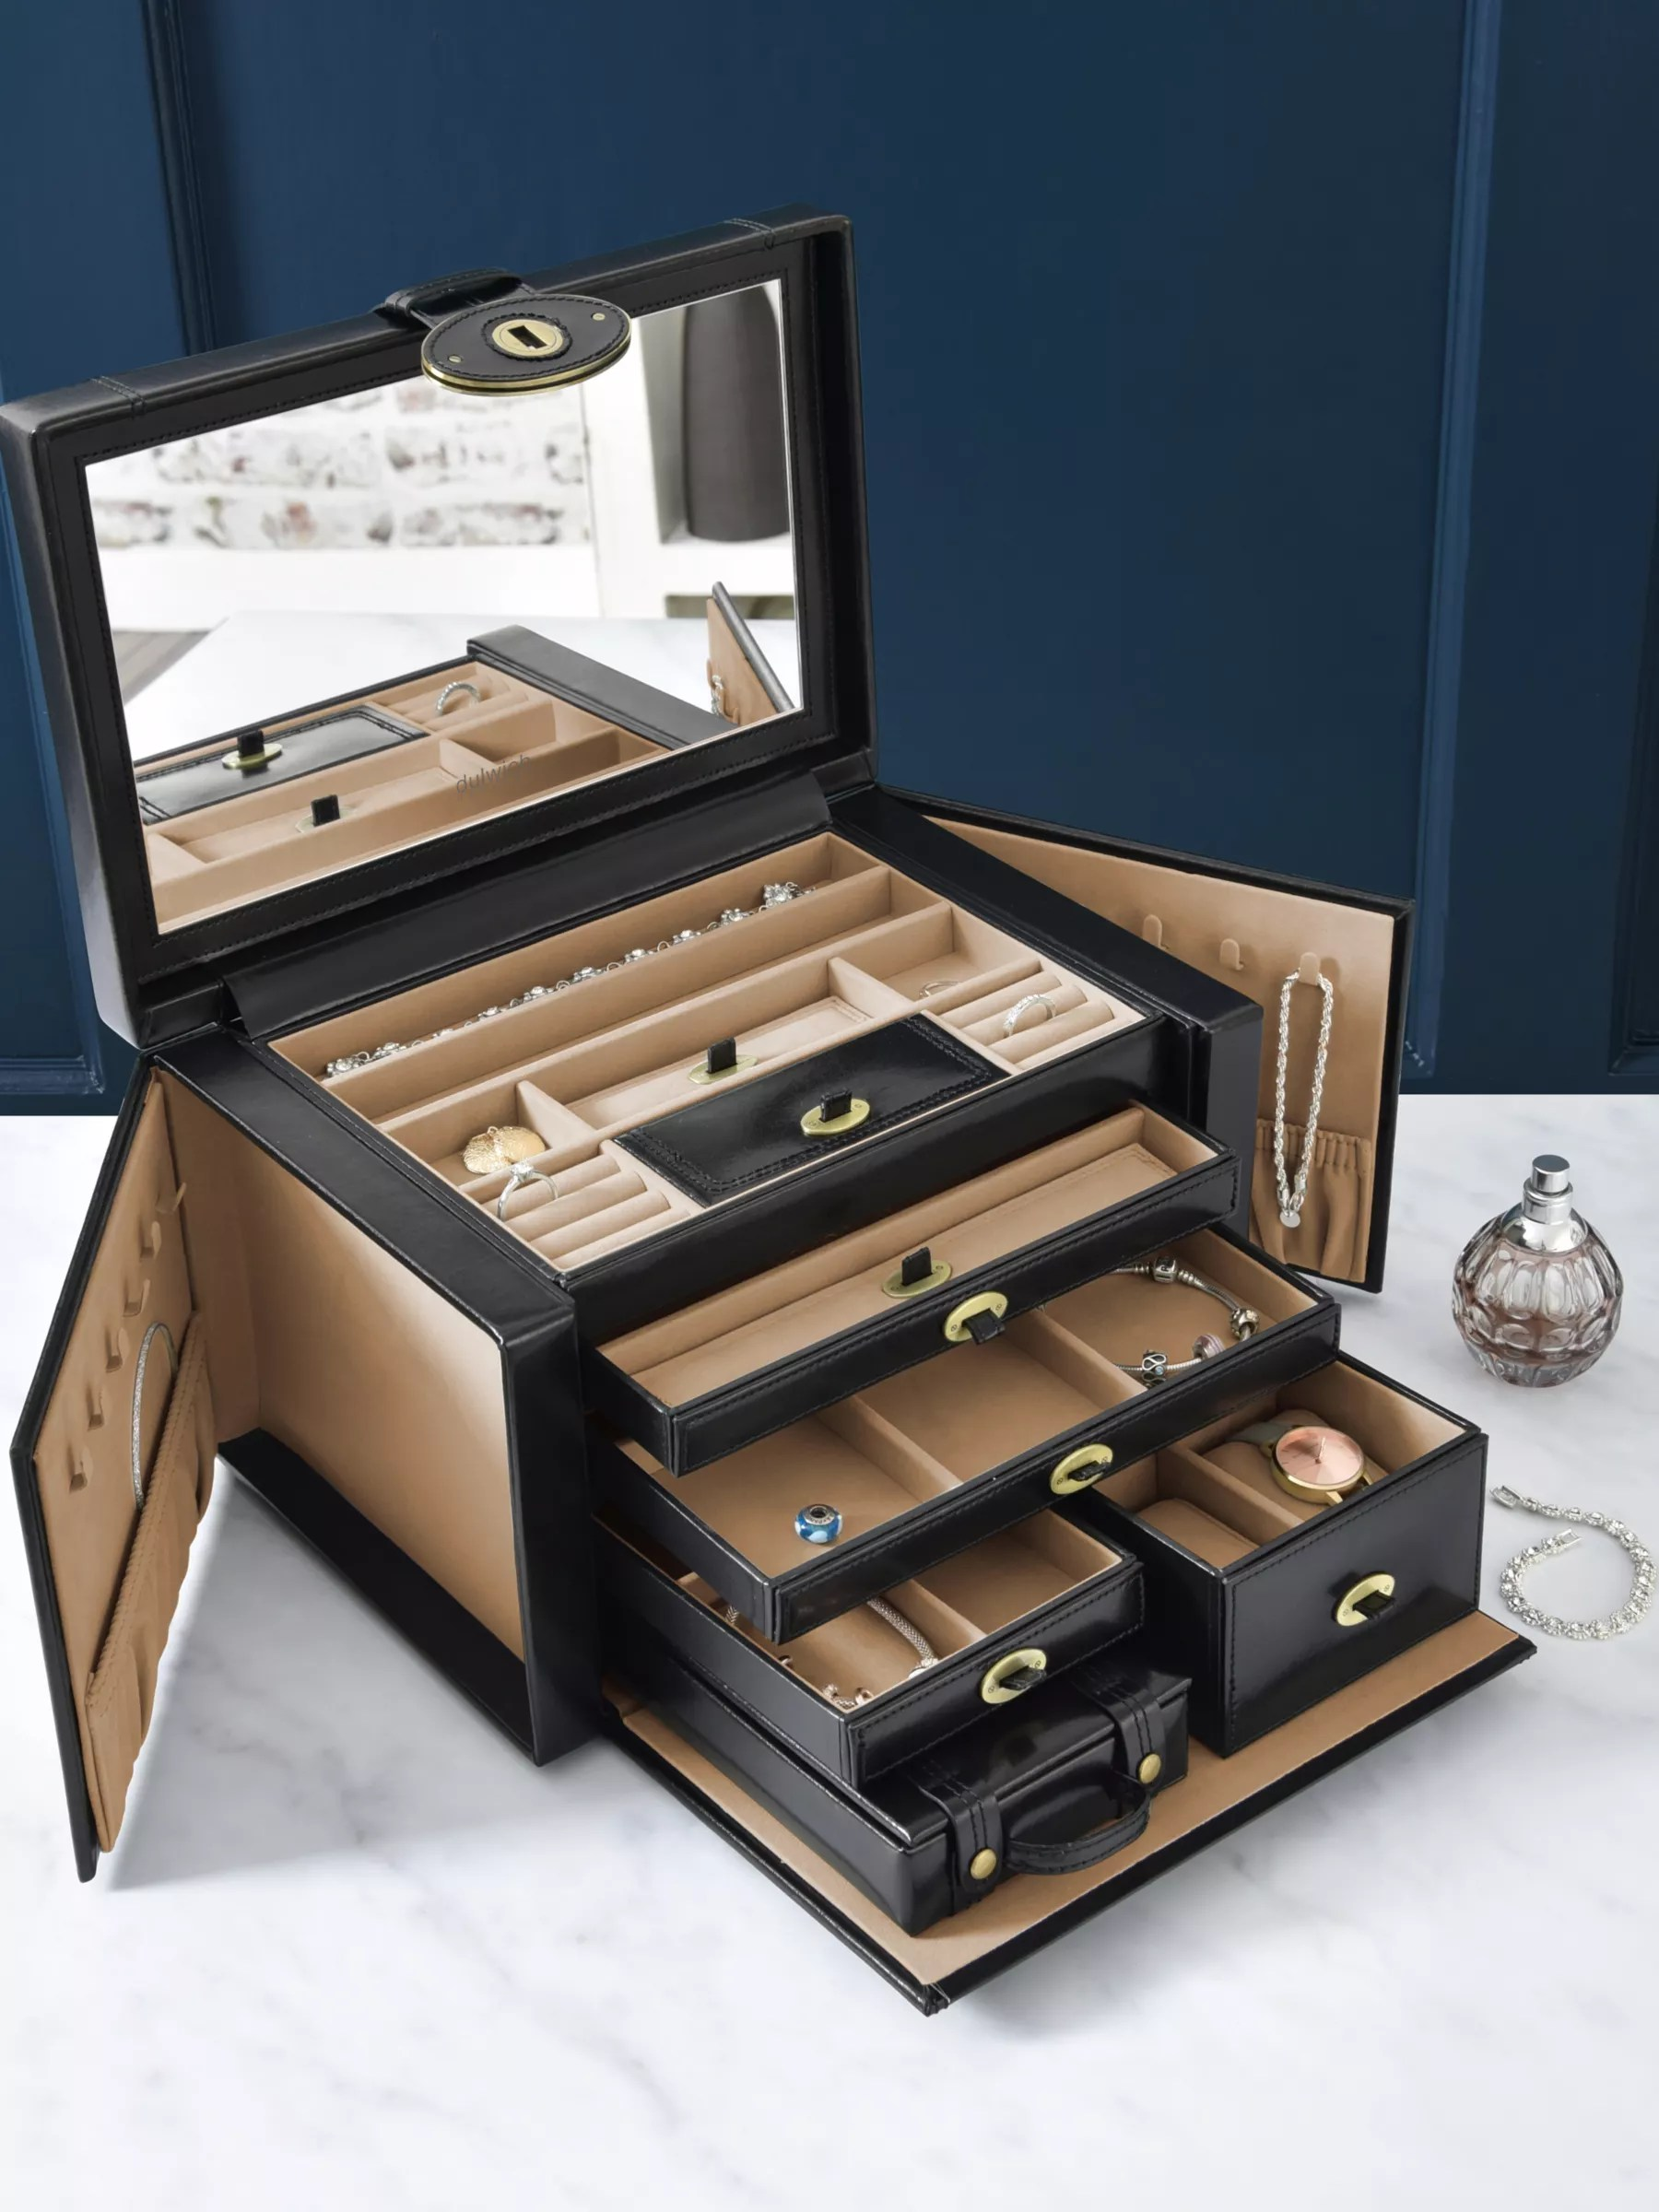 Jewelery Box Designs : jewelery, designs, Dulwich, Designs, Heritage, Extra, Large, Jewellery, Black, Lewis, Partners